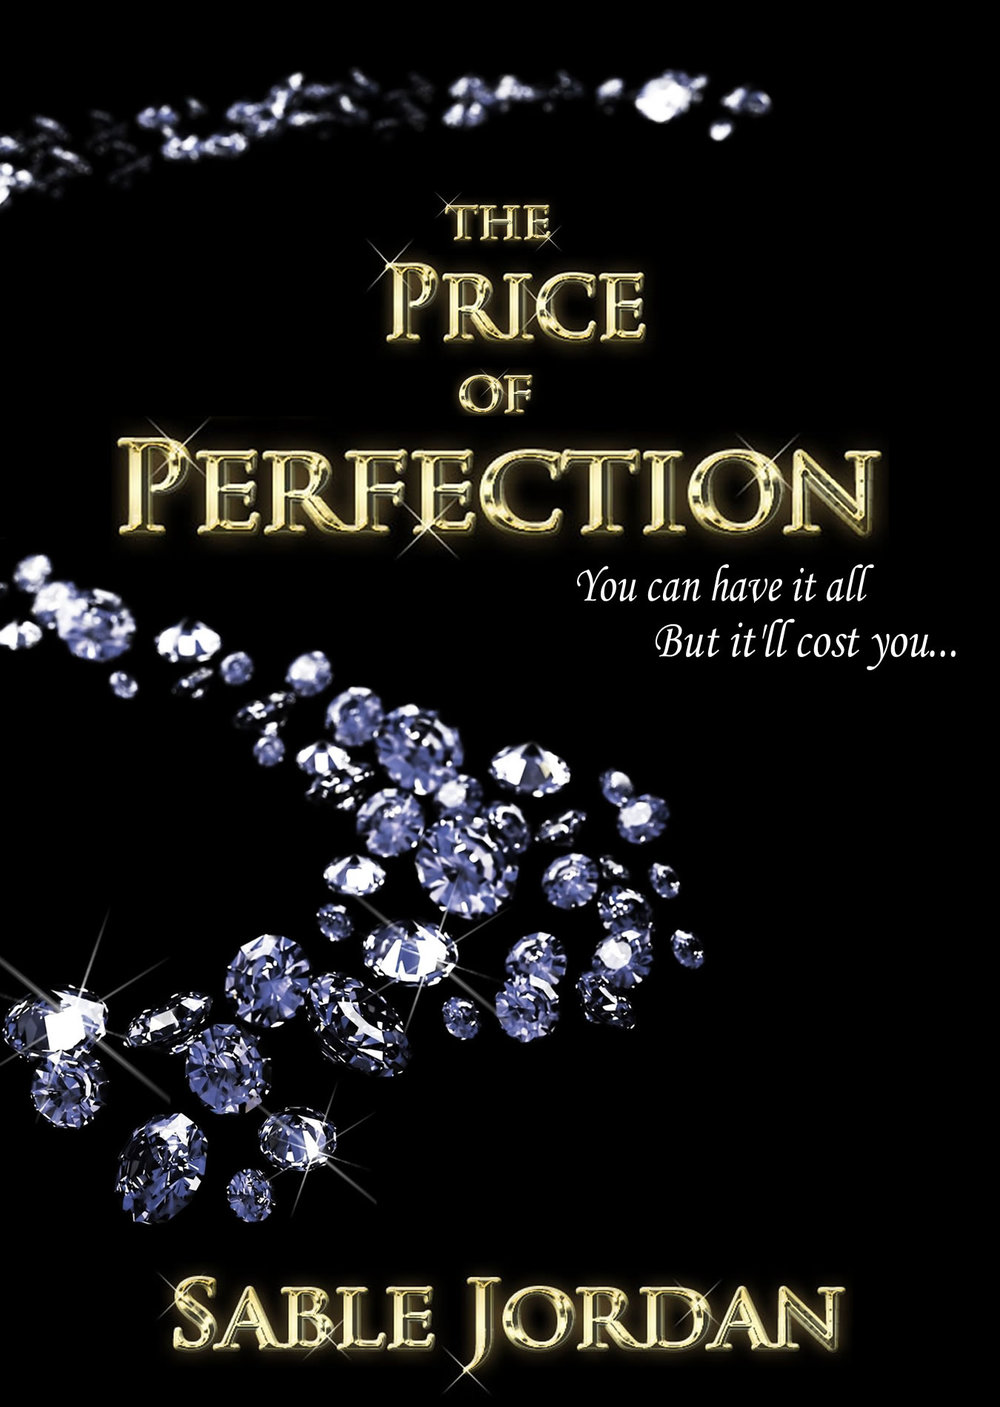 priceofperfection.jpg